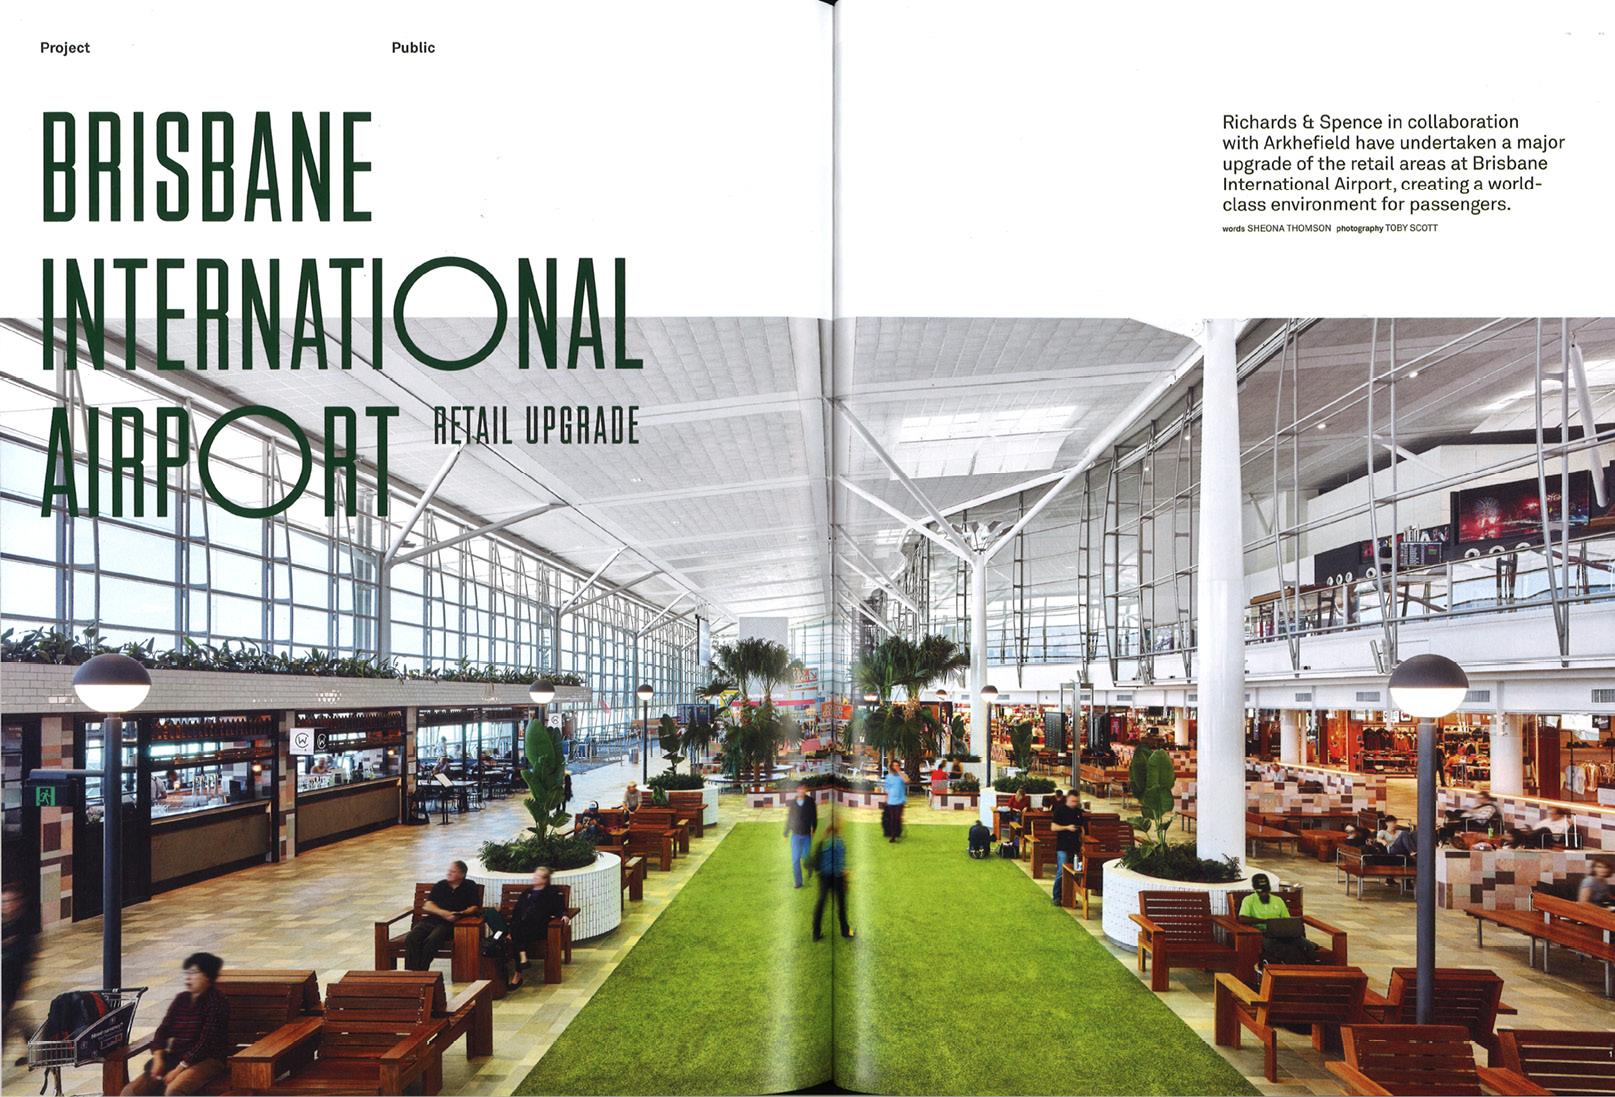 160901_ARTICHOKE_Brisbane_International_Airport_Retail_Upgrade_SPREAD_1.jpg